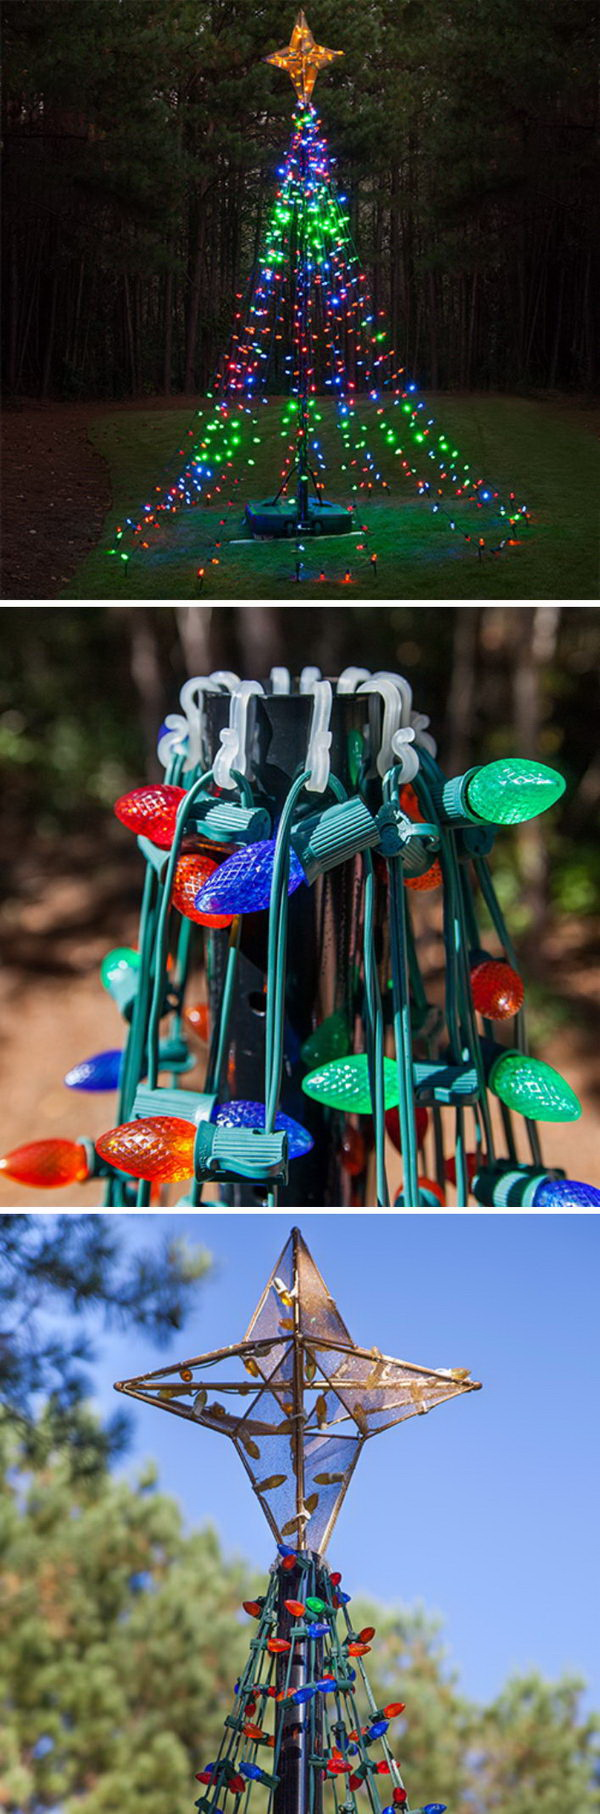 DIY Tree Of Lights Using A Basketball Pole.